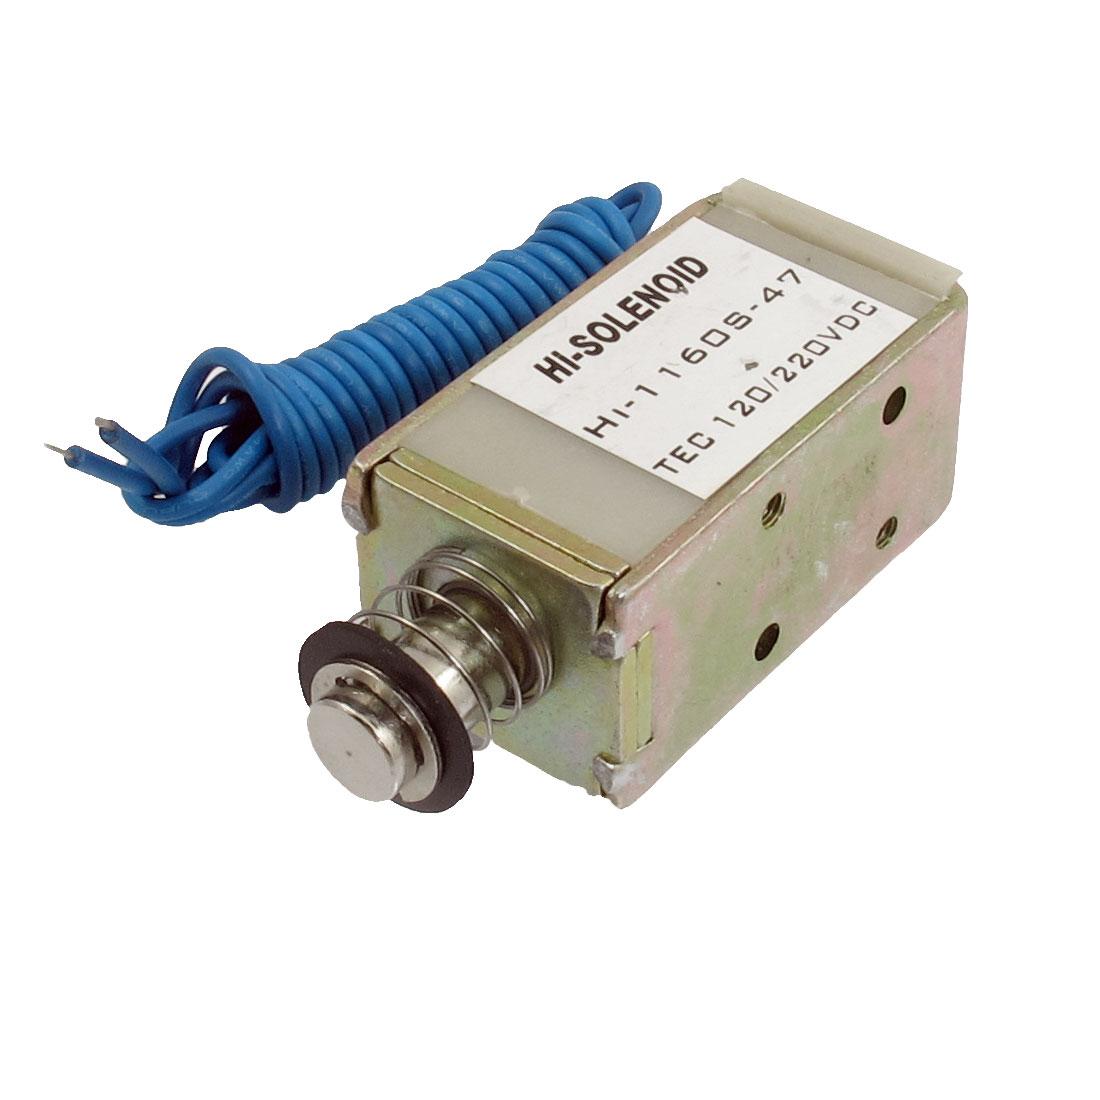 DC 220V 4.68A 16000GF 10mm Push Type Solenoid Electromagnet